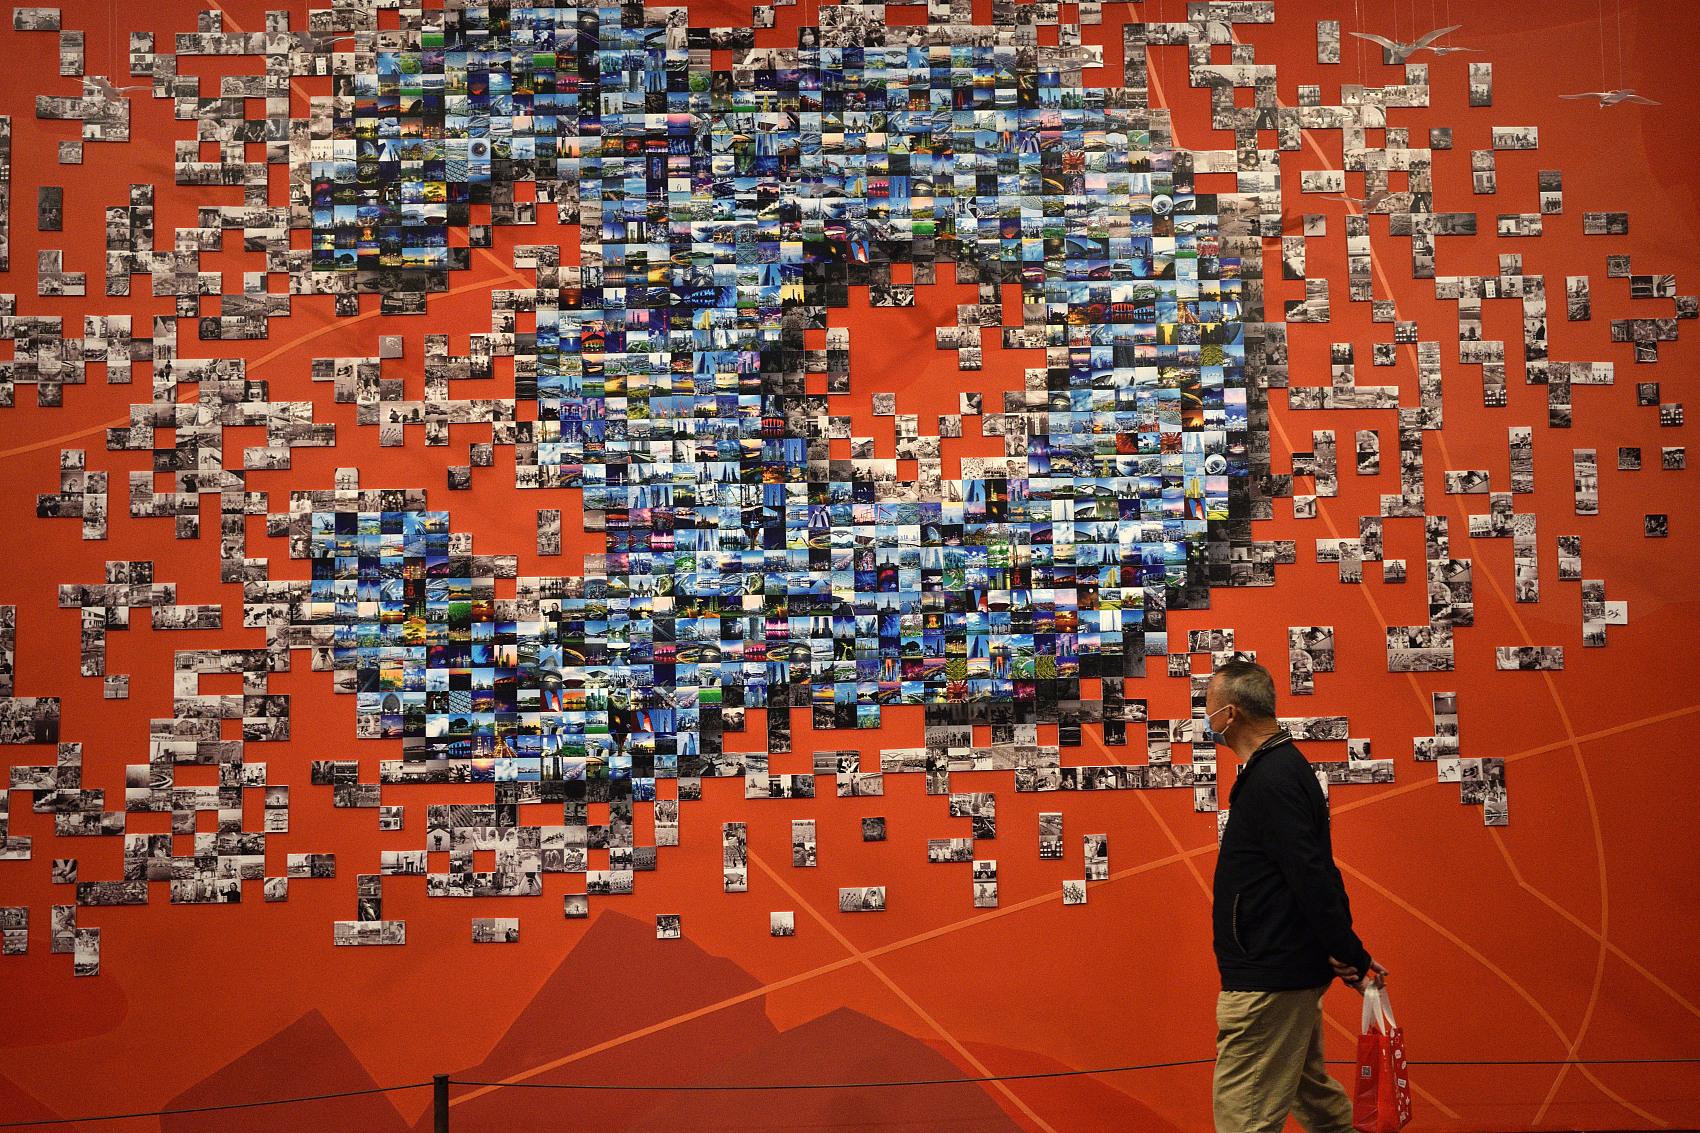 VCG111305108080观众在上海中华艺术宫观看浦东开发开放30周年艺术展。.jpg